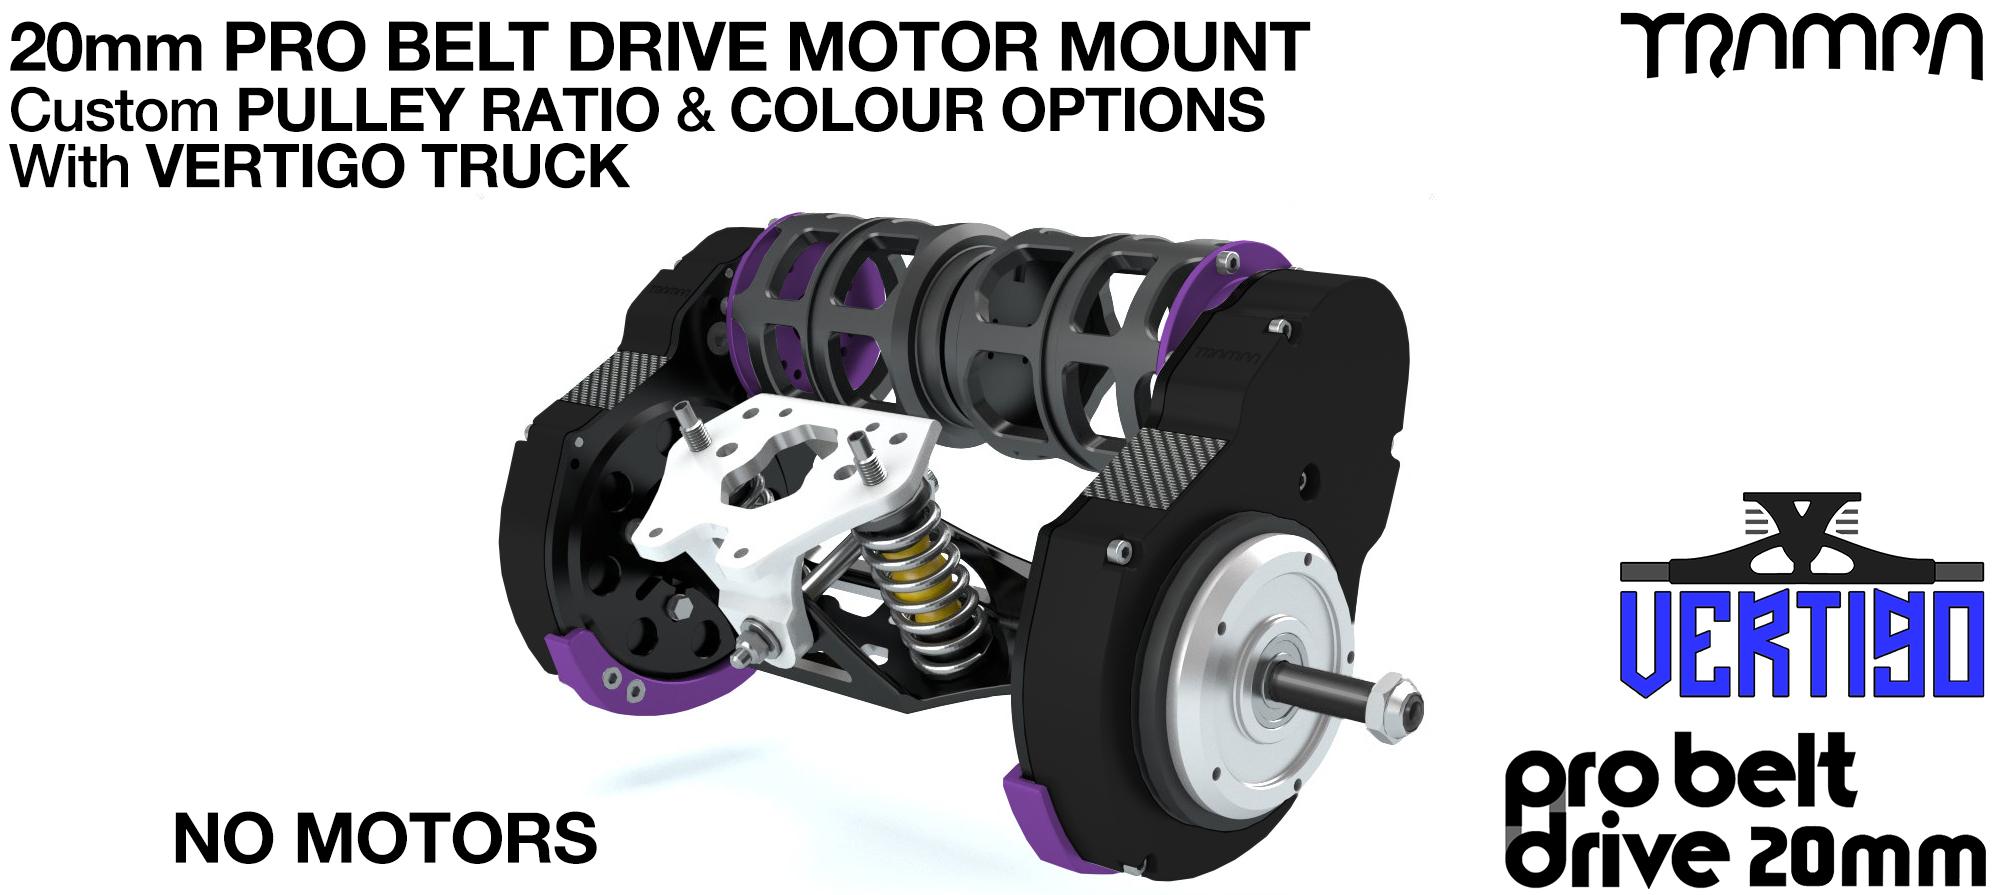 TRAMPA's 16mm  PRO Belt Drive TWIN Motor Mountainboard & Precision VERTIGO Truck - NO MOTORS